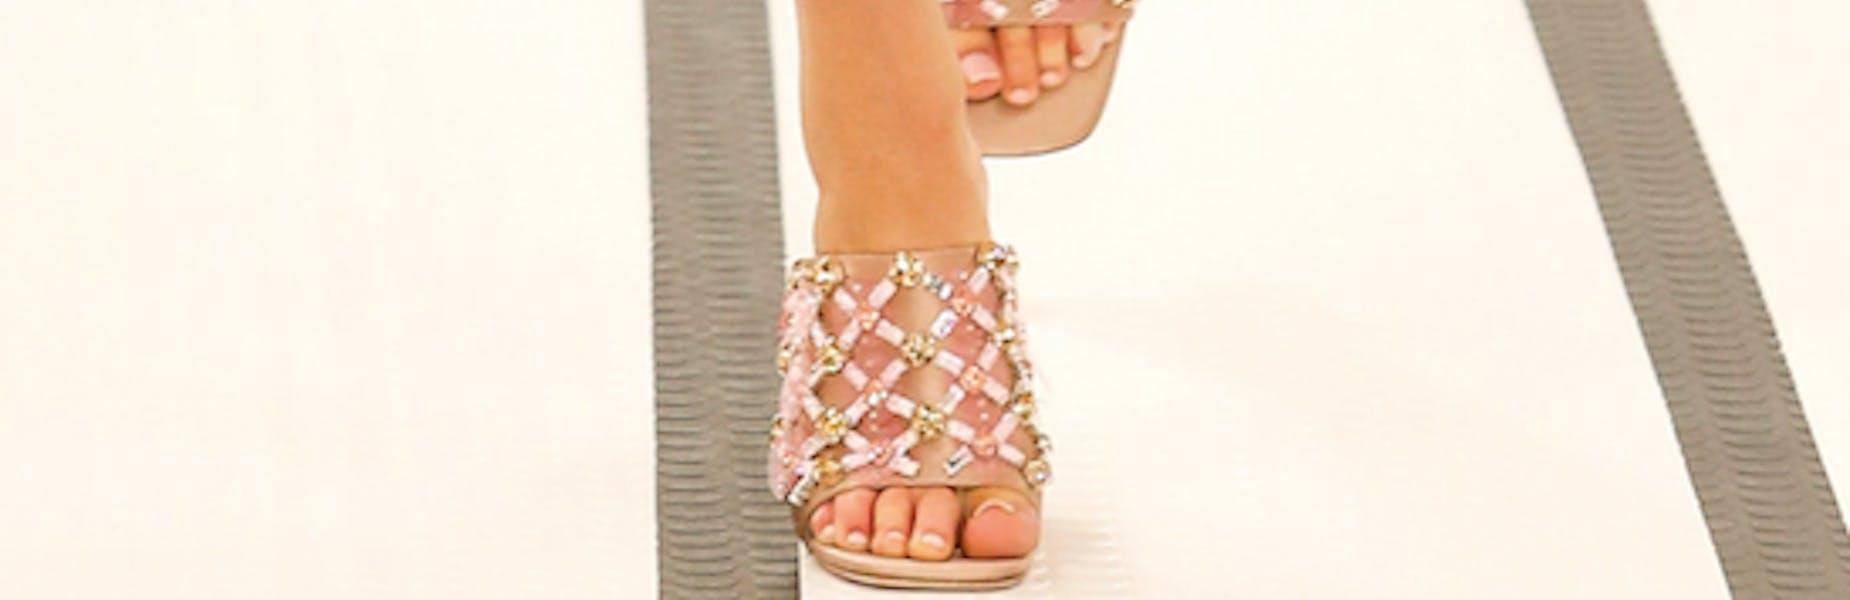 Sandali con incrostazioni Miu Miu